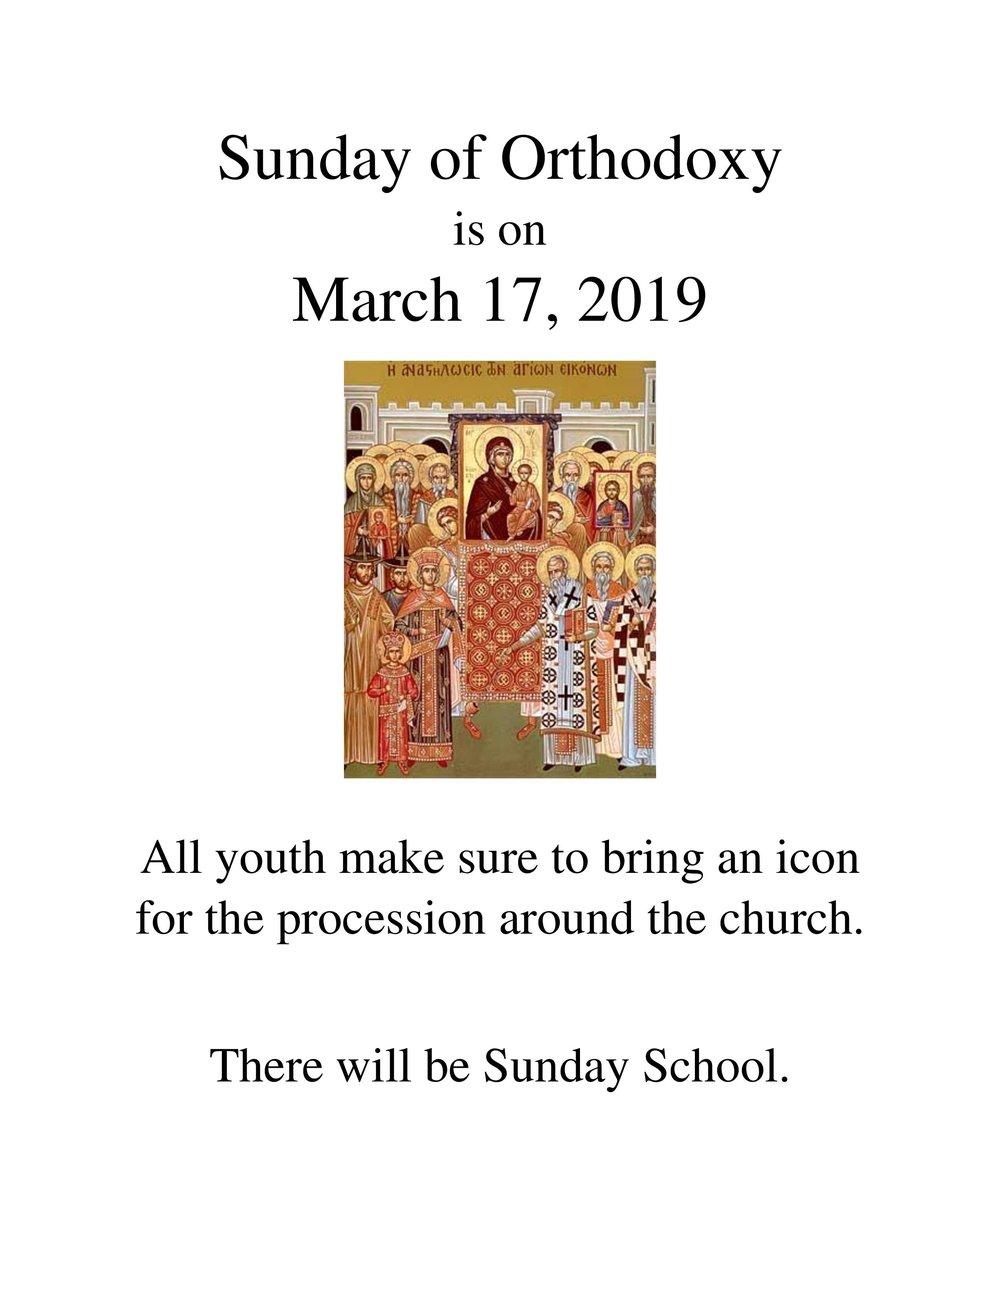 Sunday of Orthodoxy Flyer-page-001.jpg